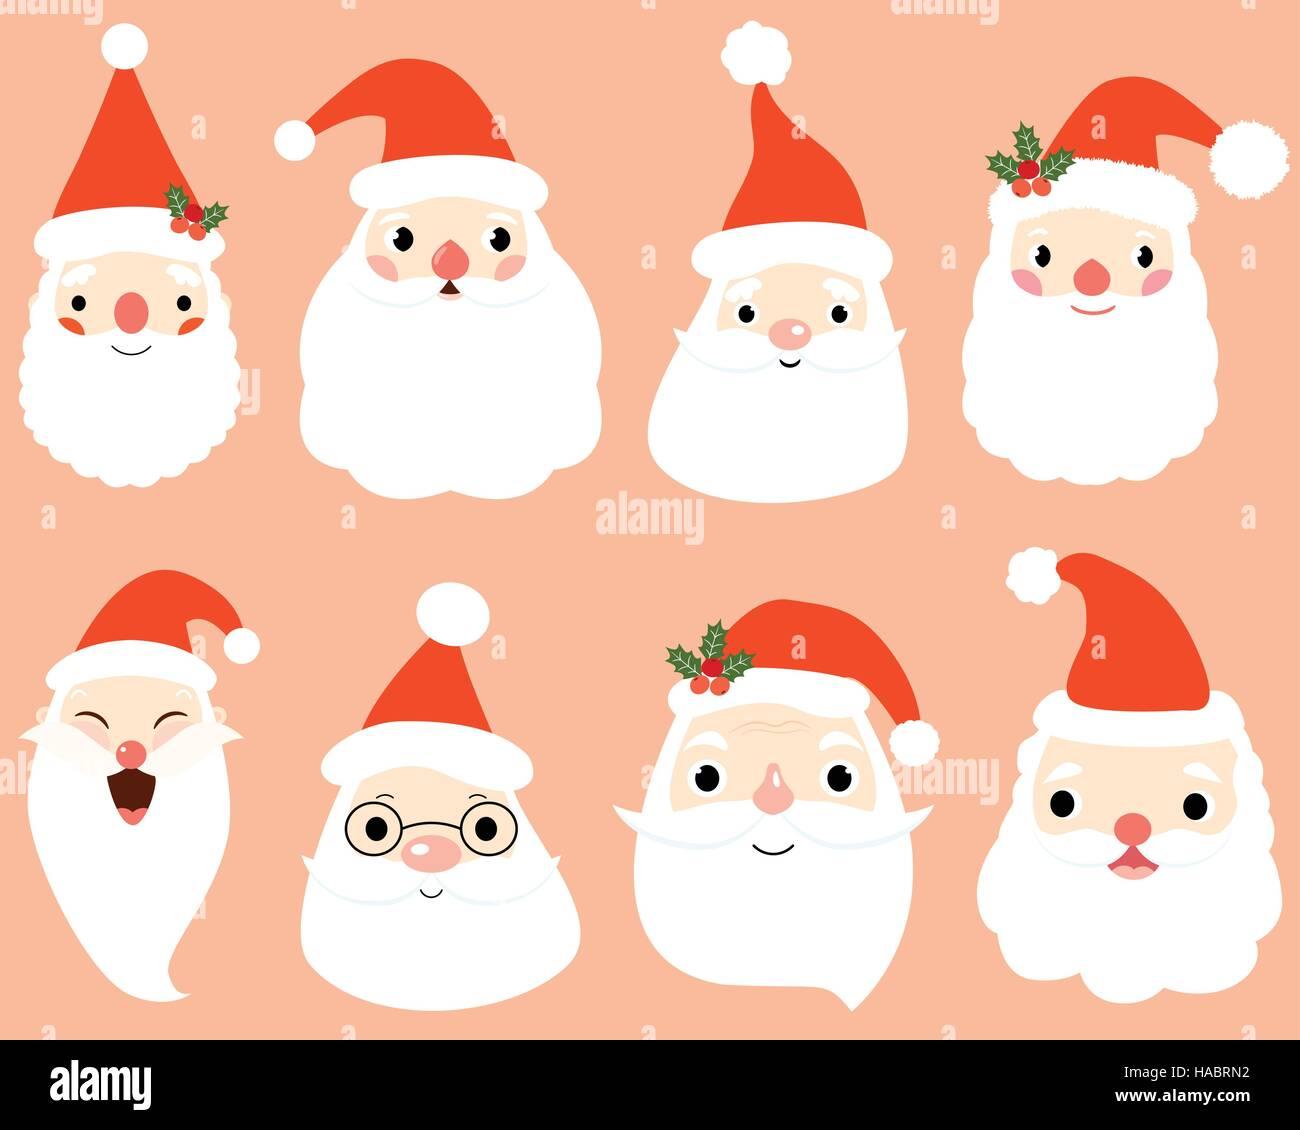 92ea96e5ac908 Cartoon Santa Claus head. Christmas vector illustration design in flat  style.